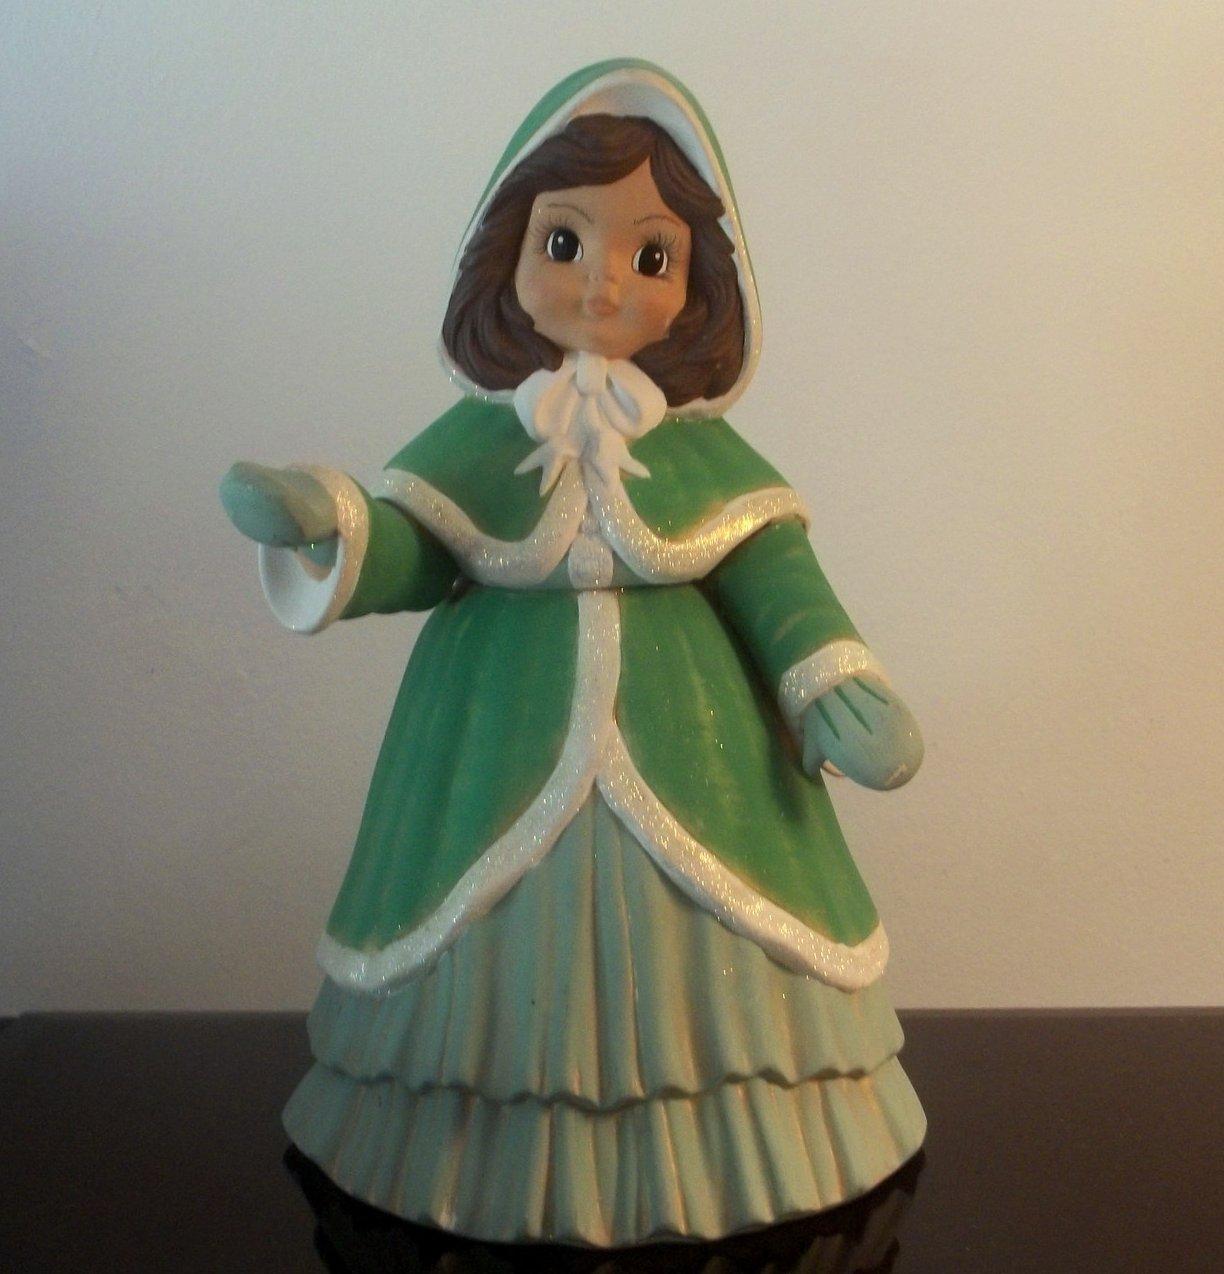 Vintage Christmas Caroler Girl Hollie 12 inches Sugarplum Collection